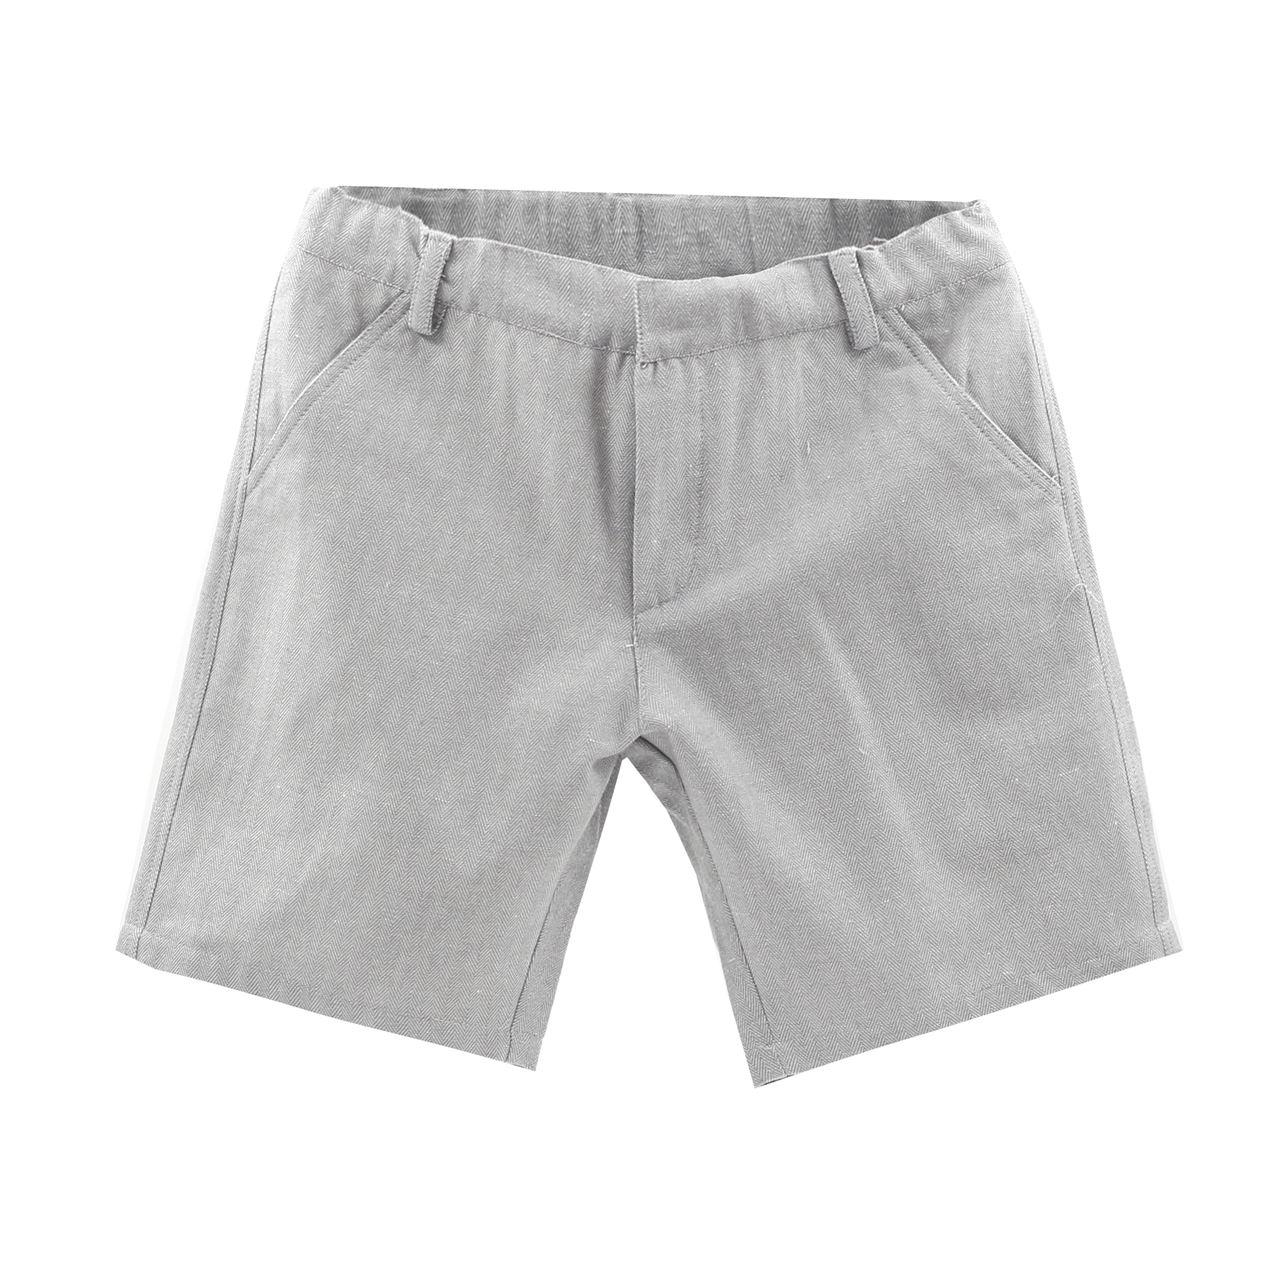 e1aee91b1 Pantalón corto niño. Dadati - Moda infantil